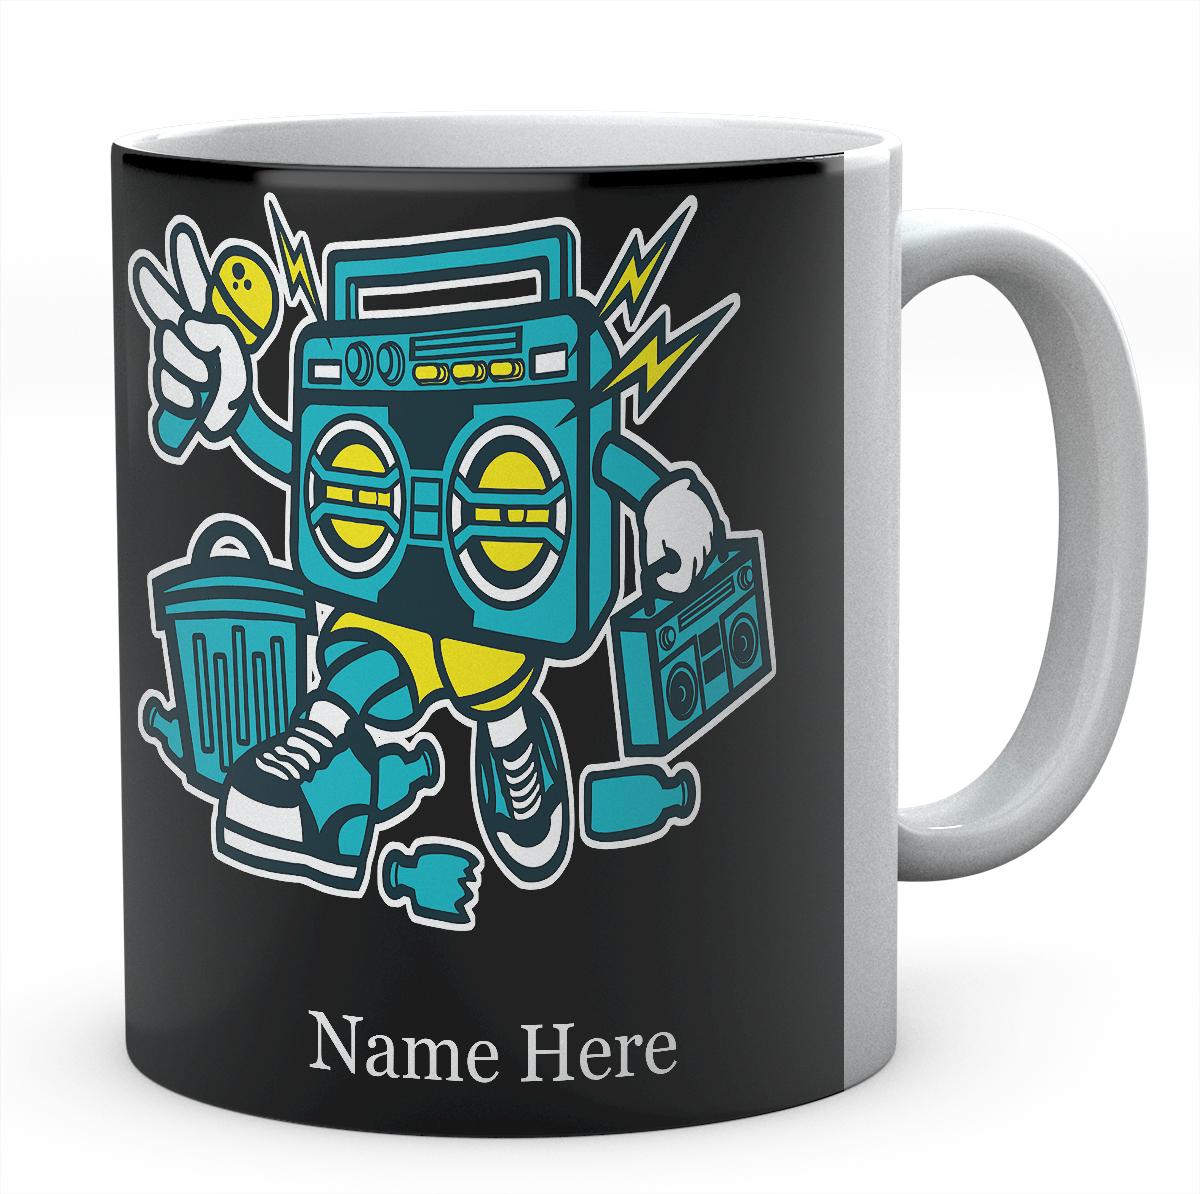 Boombox Cartoon Funny Personalised Mug